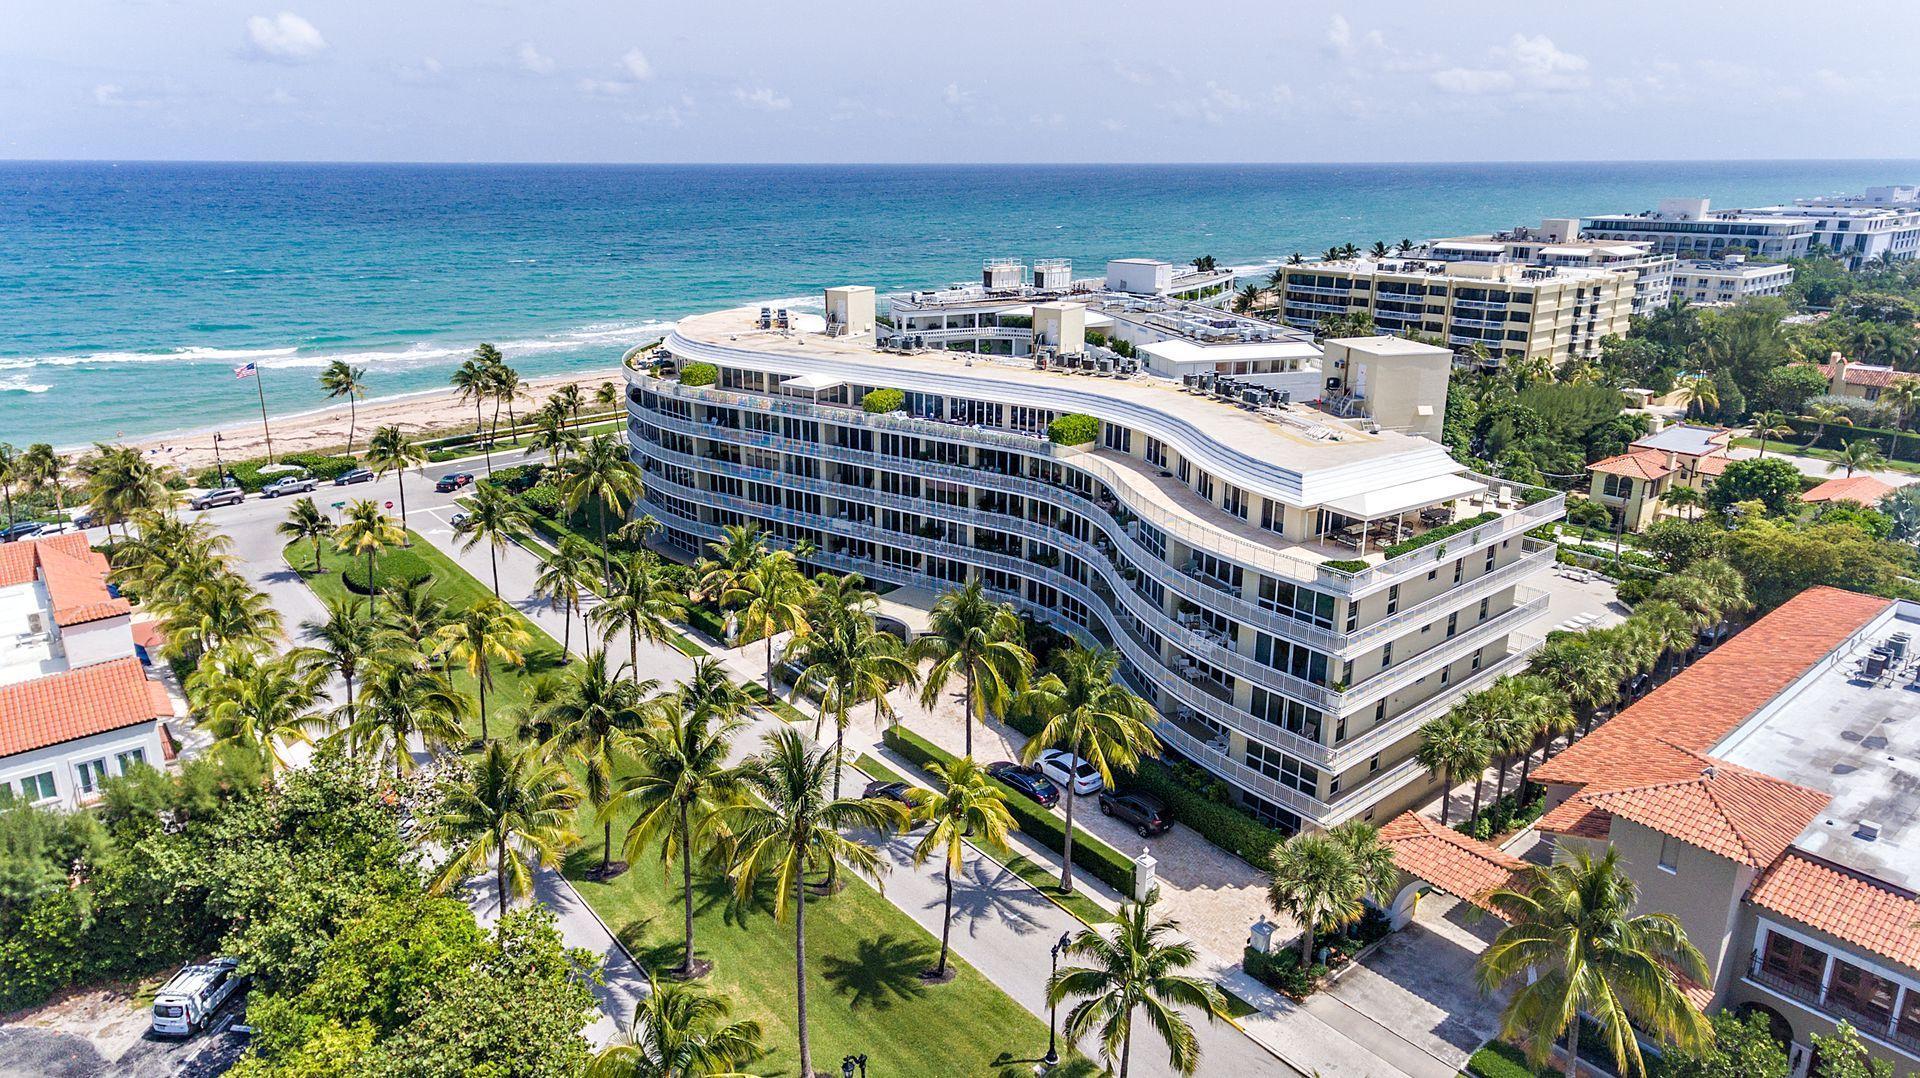 100 Royal Palm Way, Palm Beach, Florida 33480, 3 Bedrooms Bedrooms, ,4 BathroomsBathrooms,Condo/Coop,For Sale,Royal Palm,1,RX-10520792